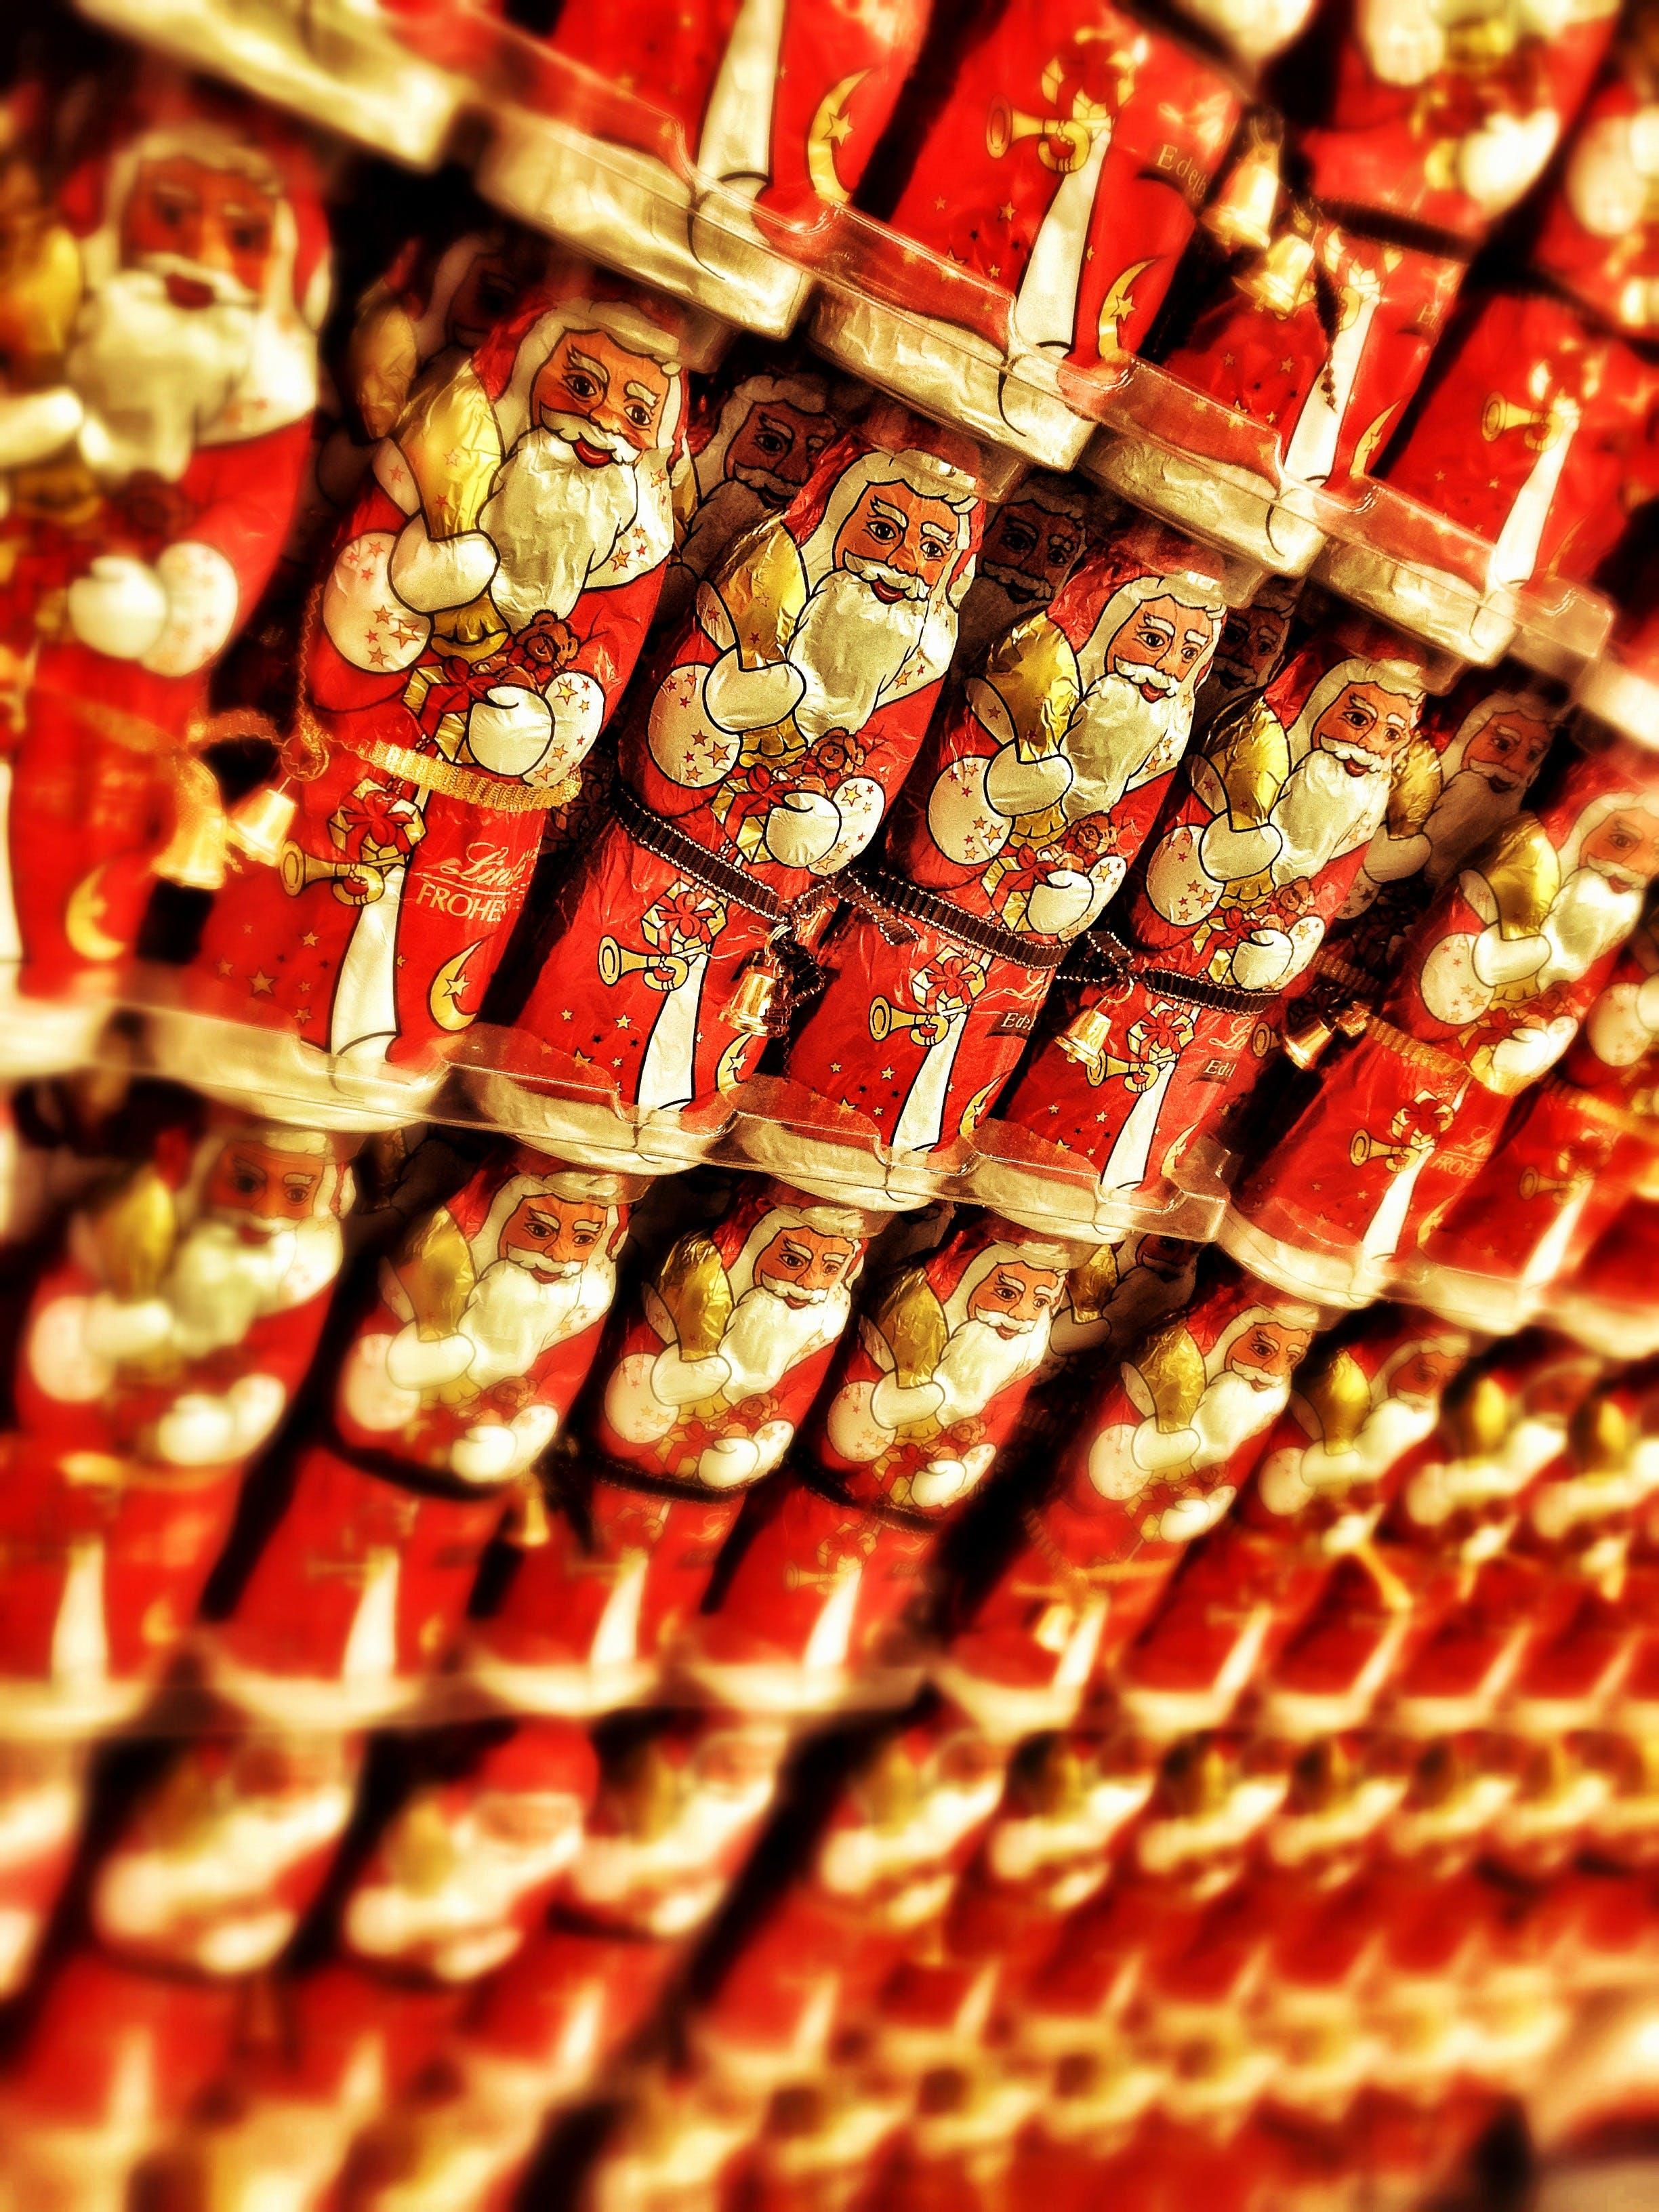 Foto profissional grátis de Natal, Papai Noel, papai noel de chocolate